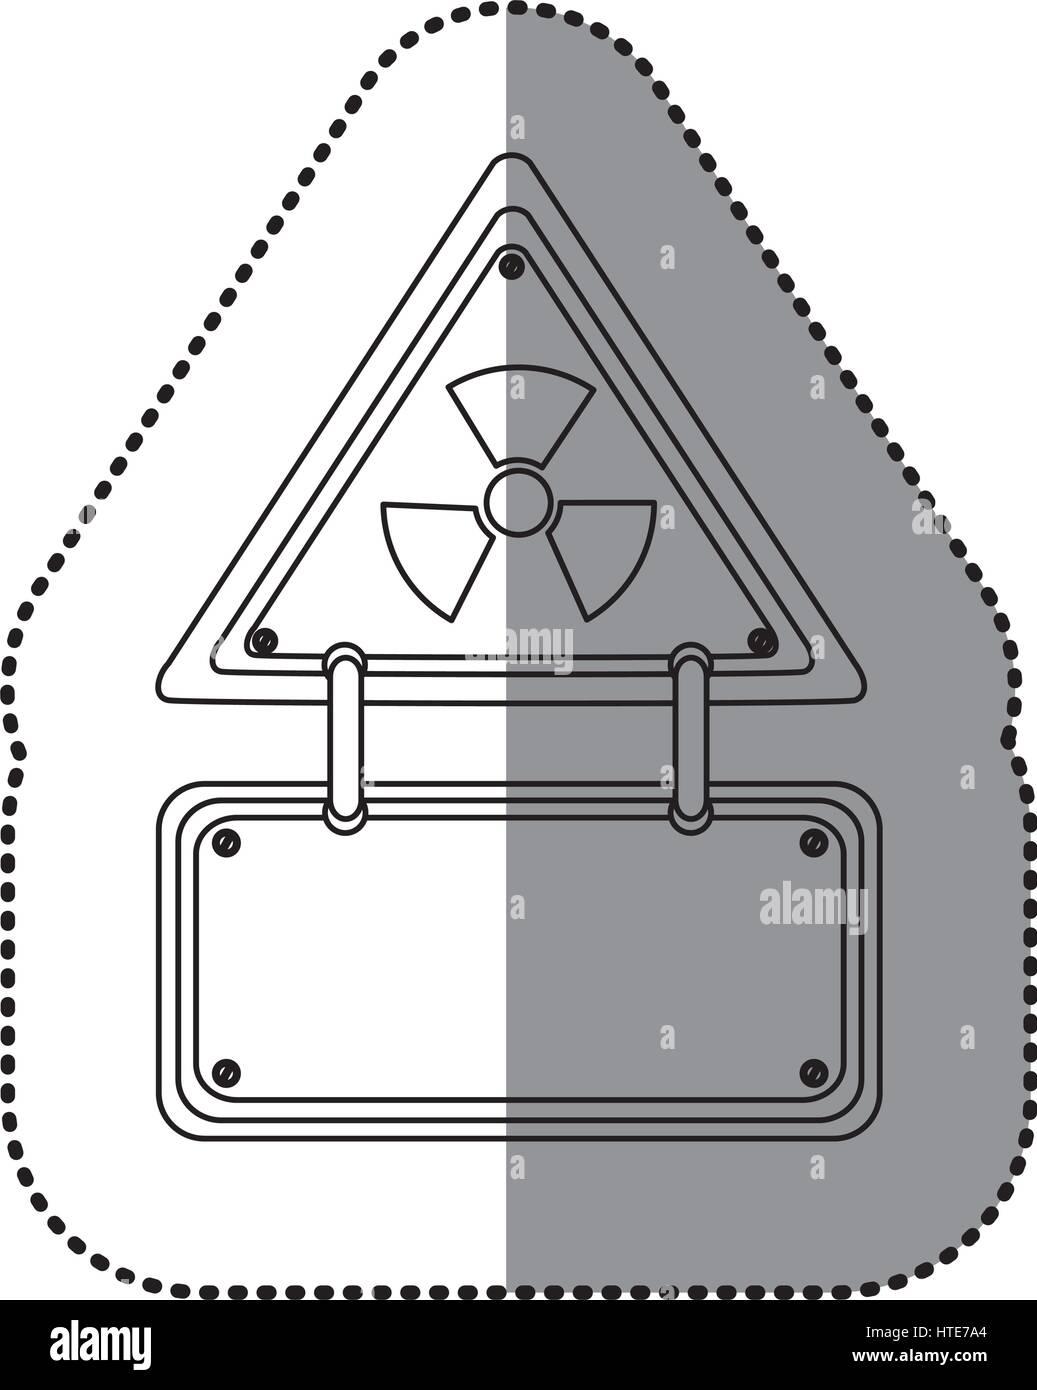 Monochrome silhouette sticker with warning triangle with monochrome silhouette sticker with warning triangle with radioactive symbol and rectangular plate buycottarizona